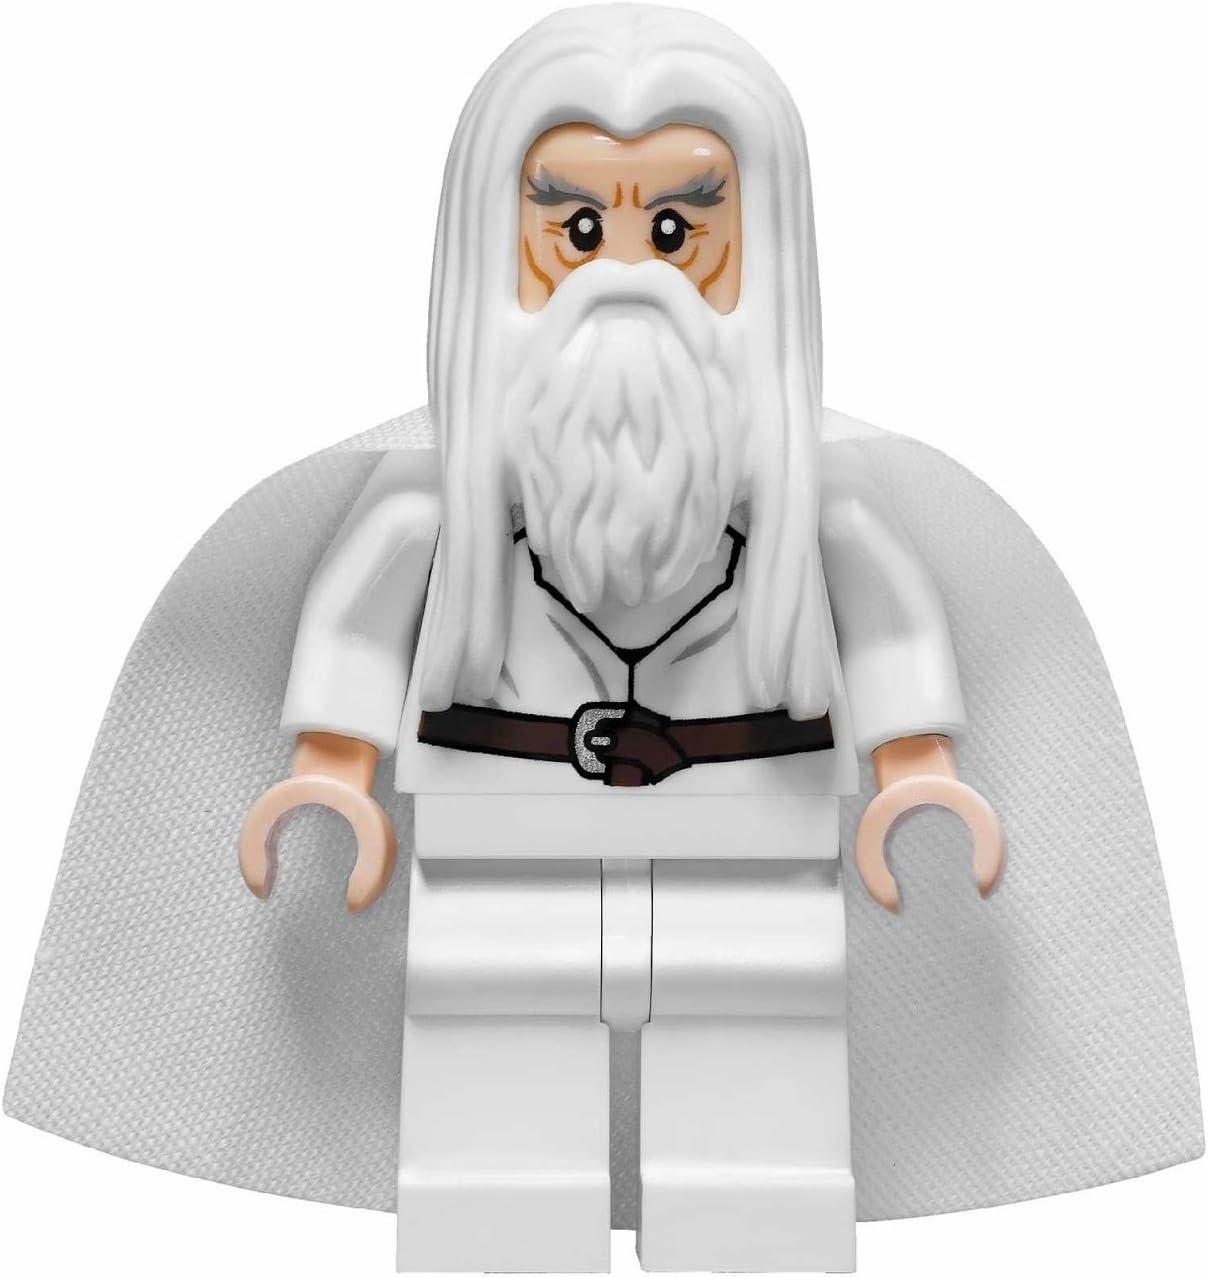 Lego Gandalf The White Mini Figure From Set 79007